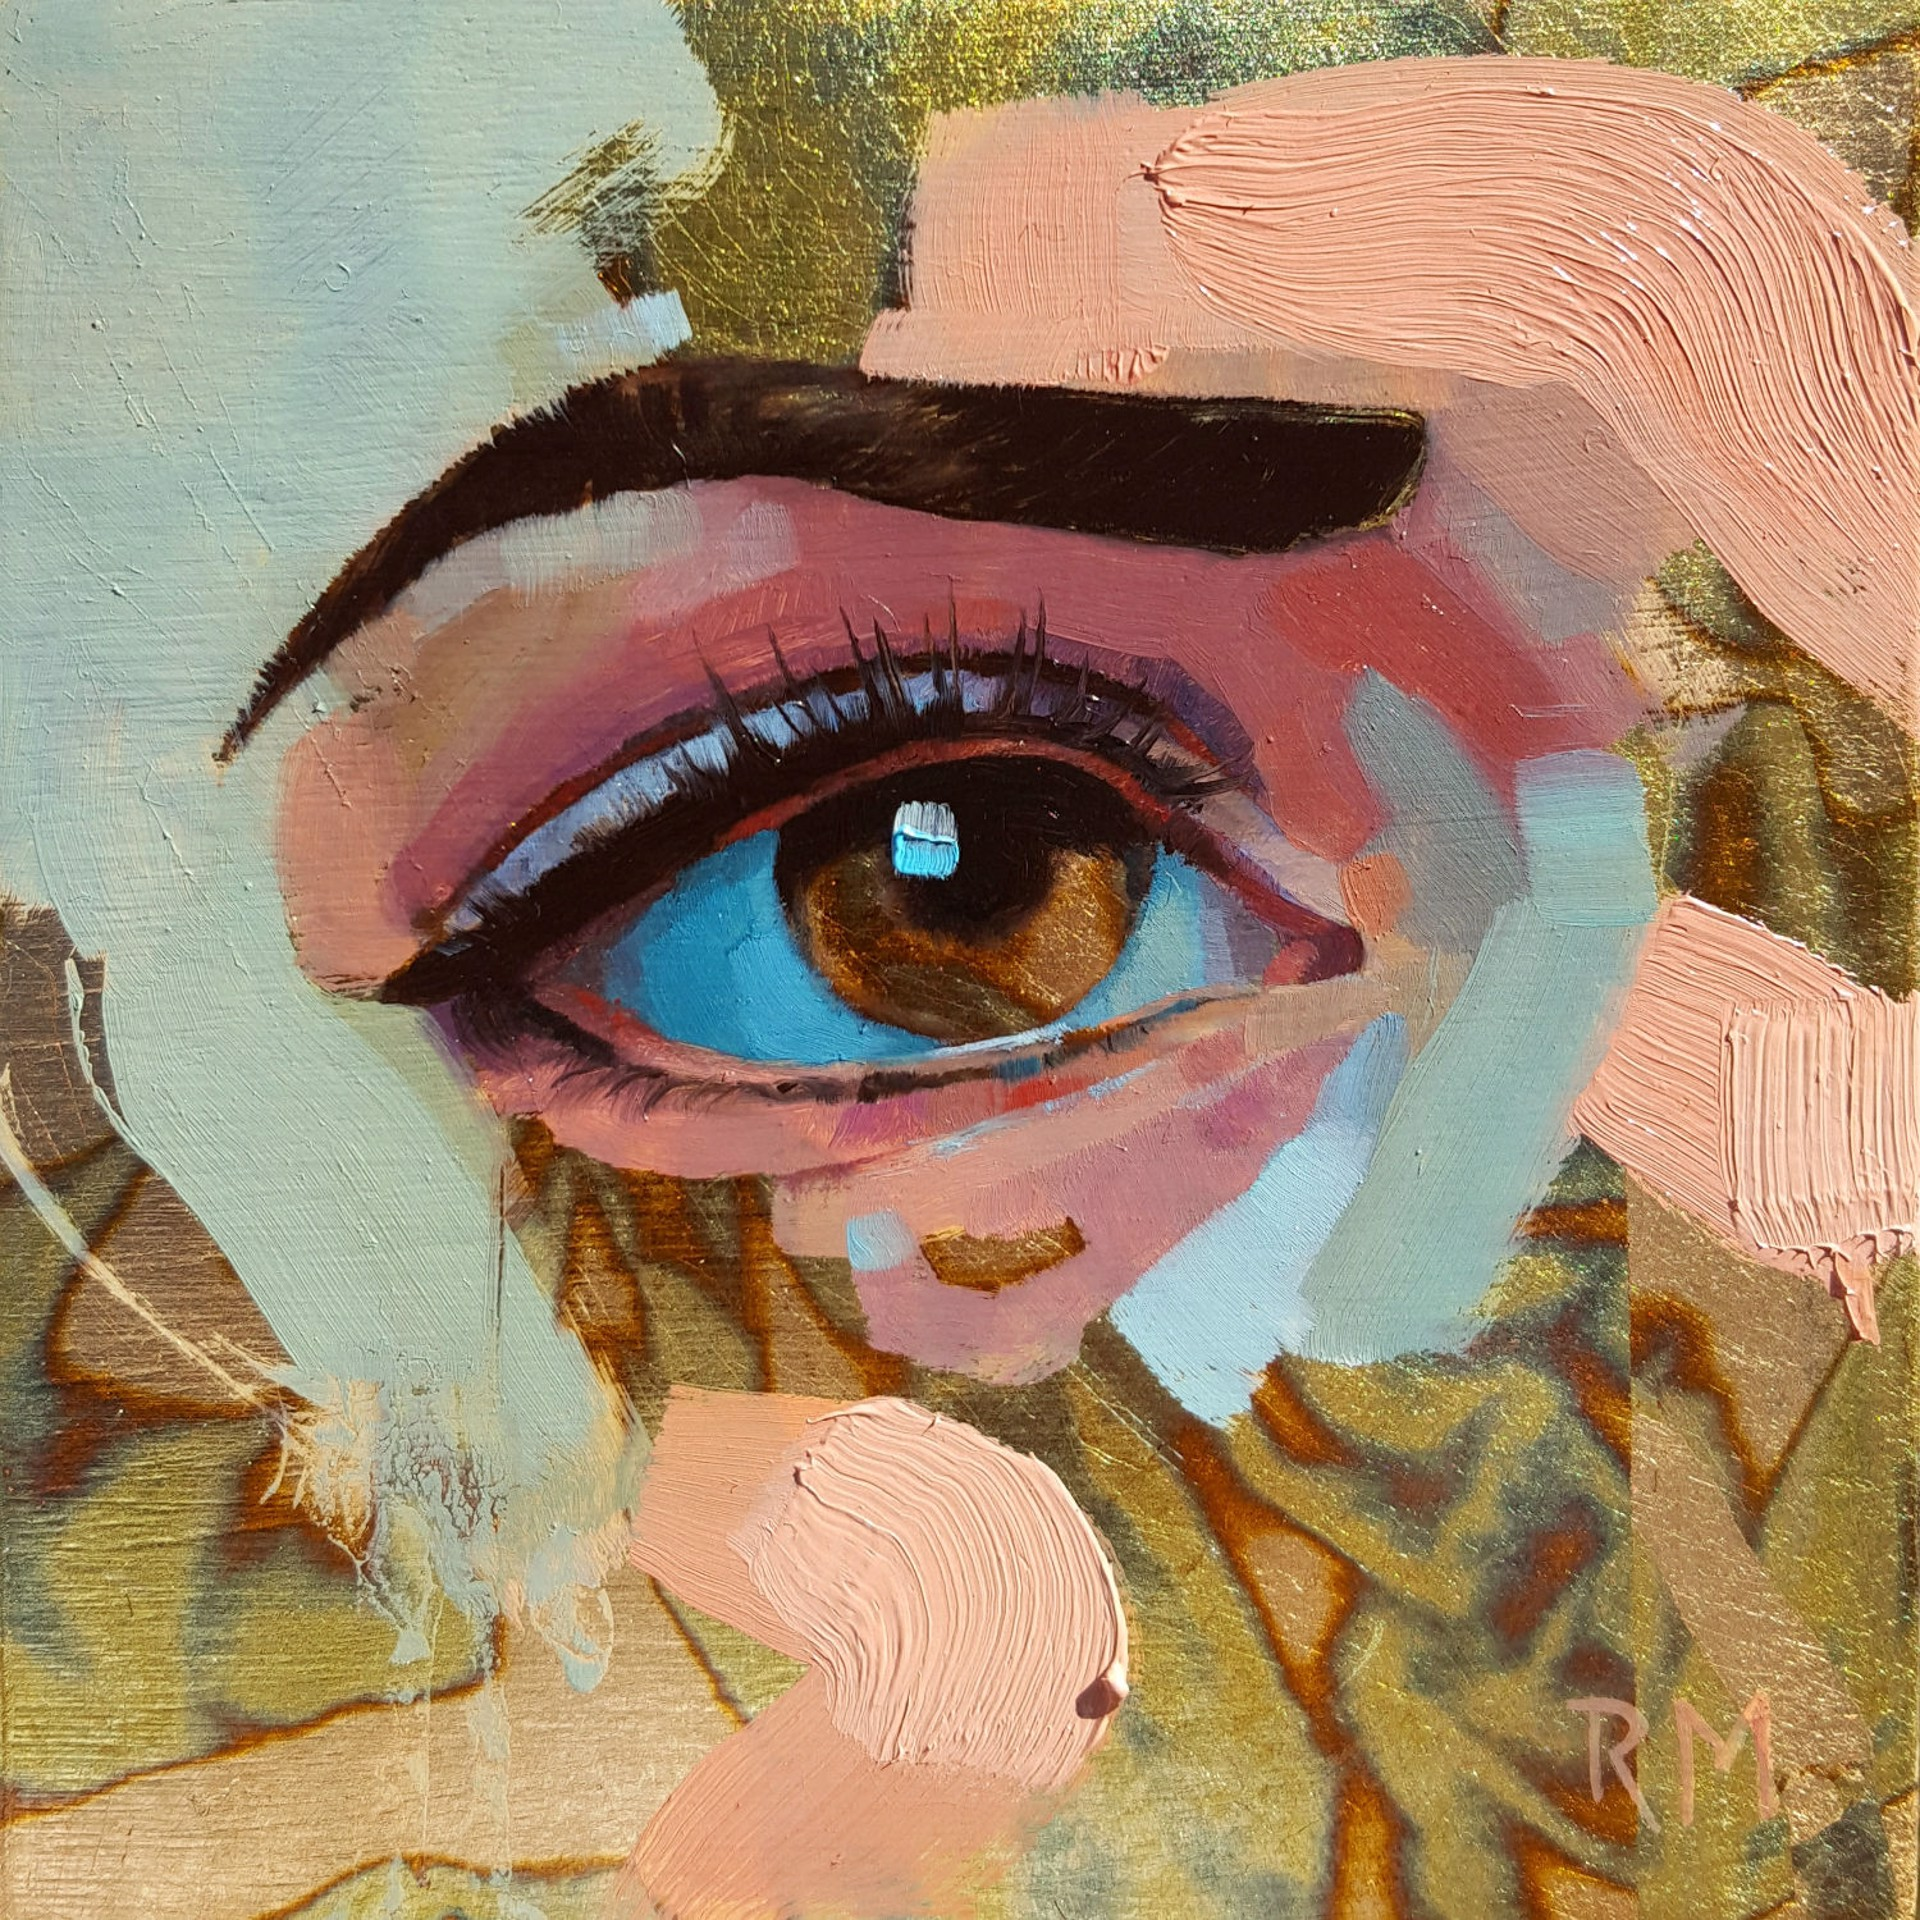 Variegated Eye by Ryan Morse